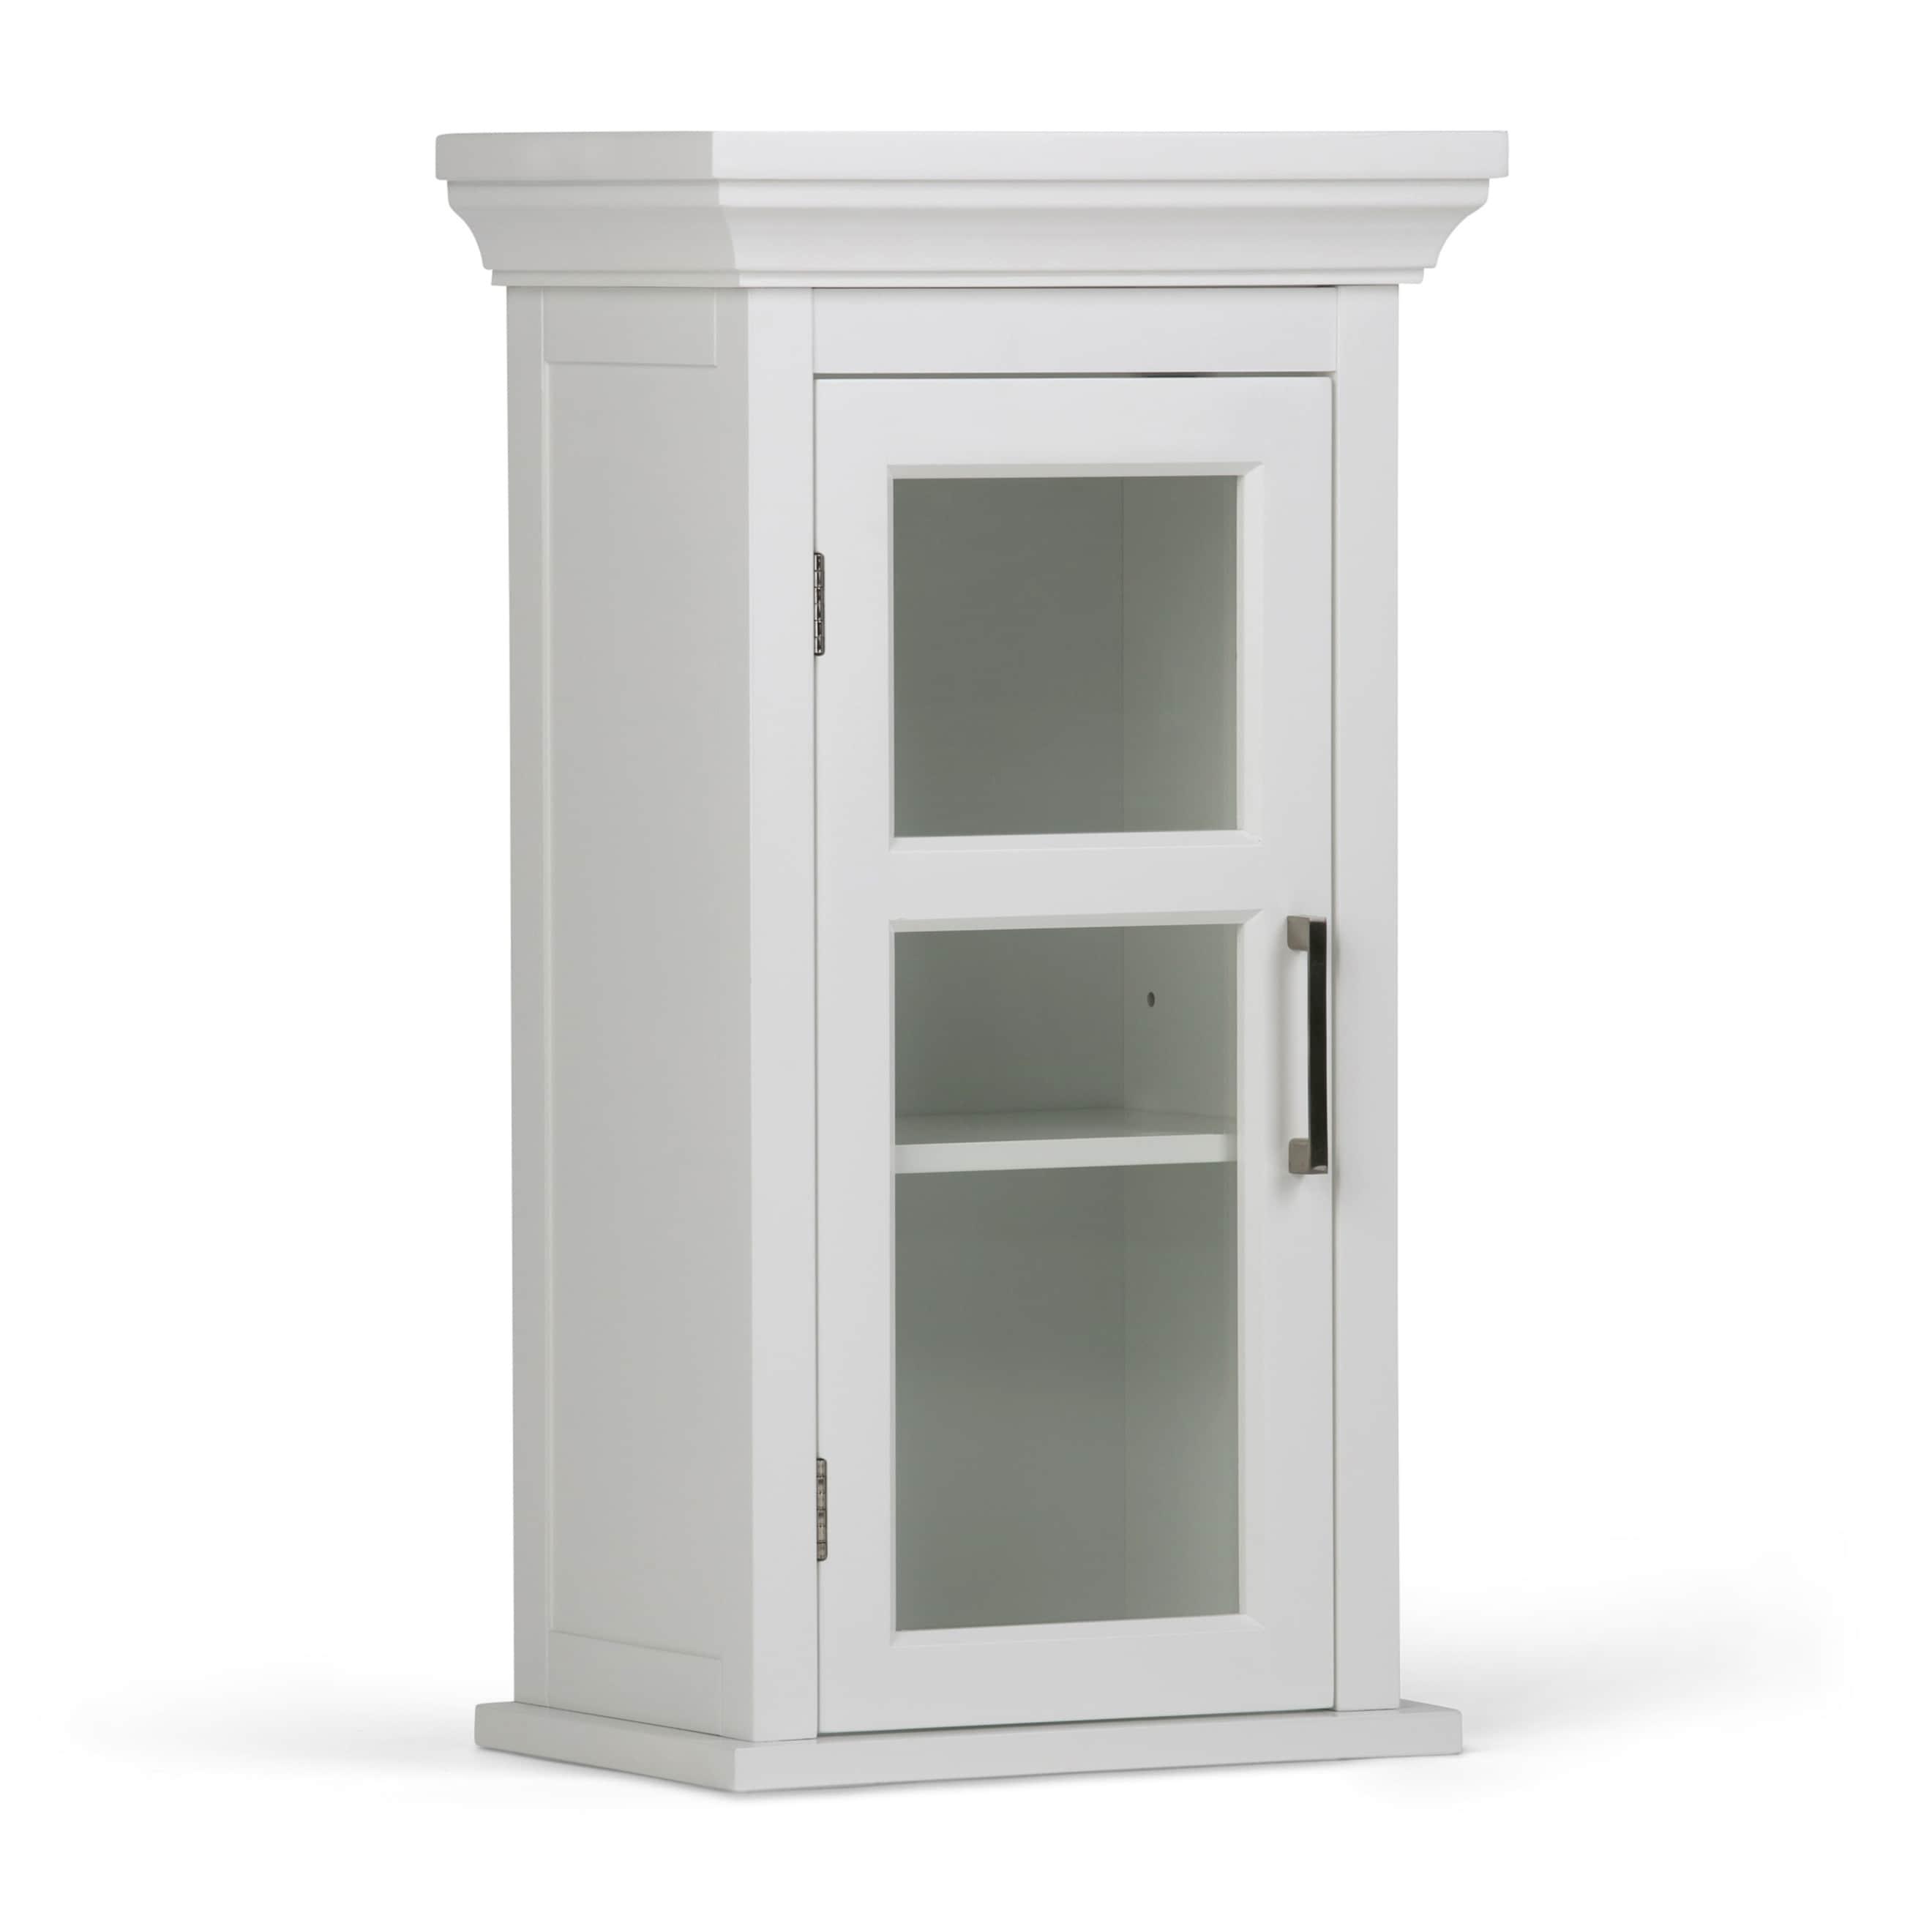 Shop WYNDENHALL Hayes Single Door Bathroom Wall Cabinet in White ...